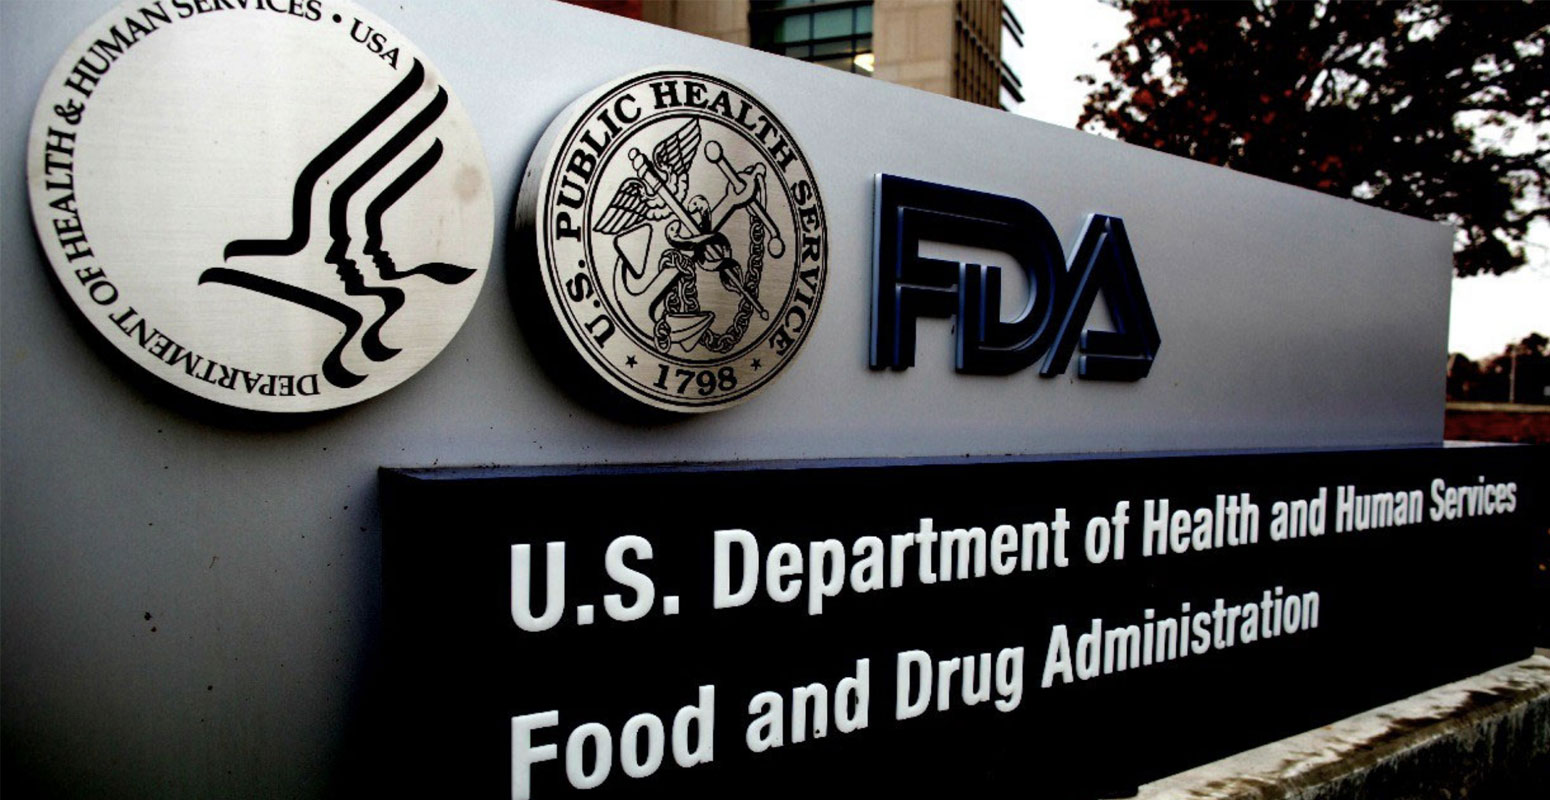 Cancer drug earns FDA nod after decades - WORLDiscoveries